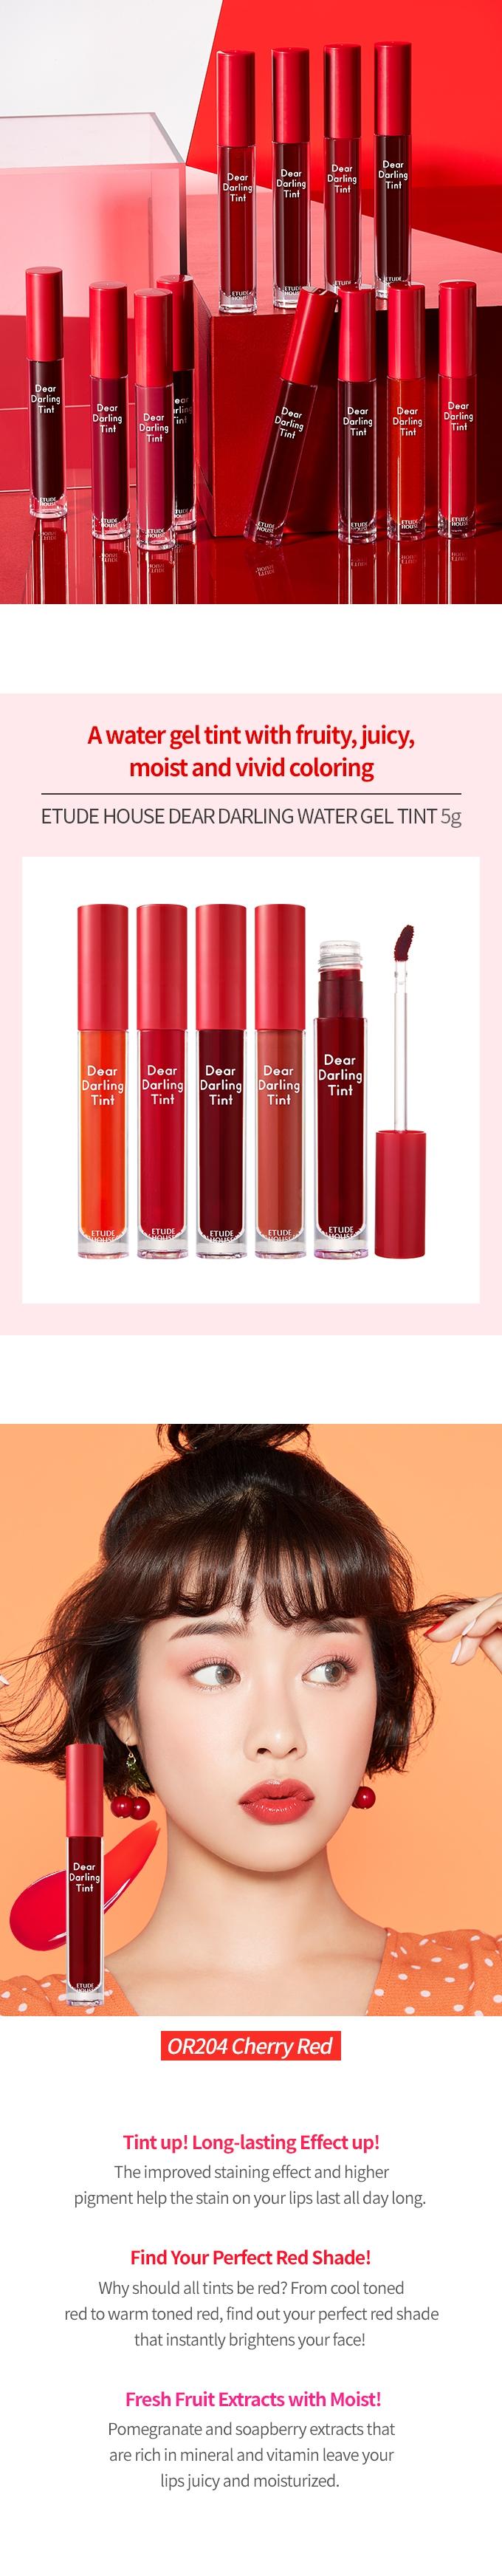 Dear Darling Water Gel Tint #OR203 Grapefruit Red